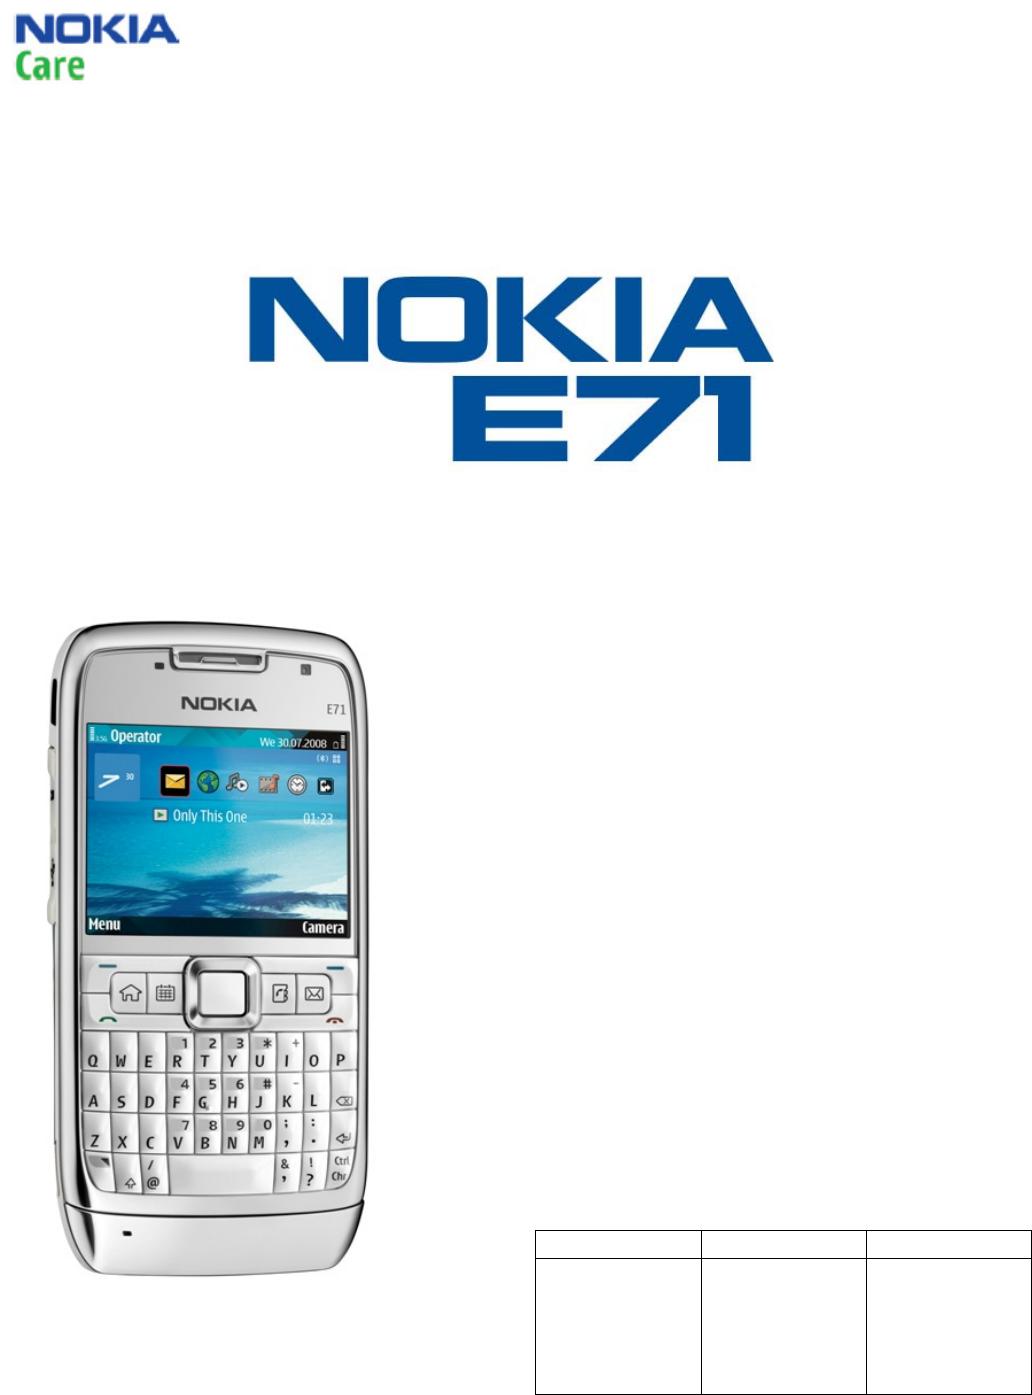 Nokia Standard E71 Rm 346, 357, 407 Service Manual 1,2